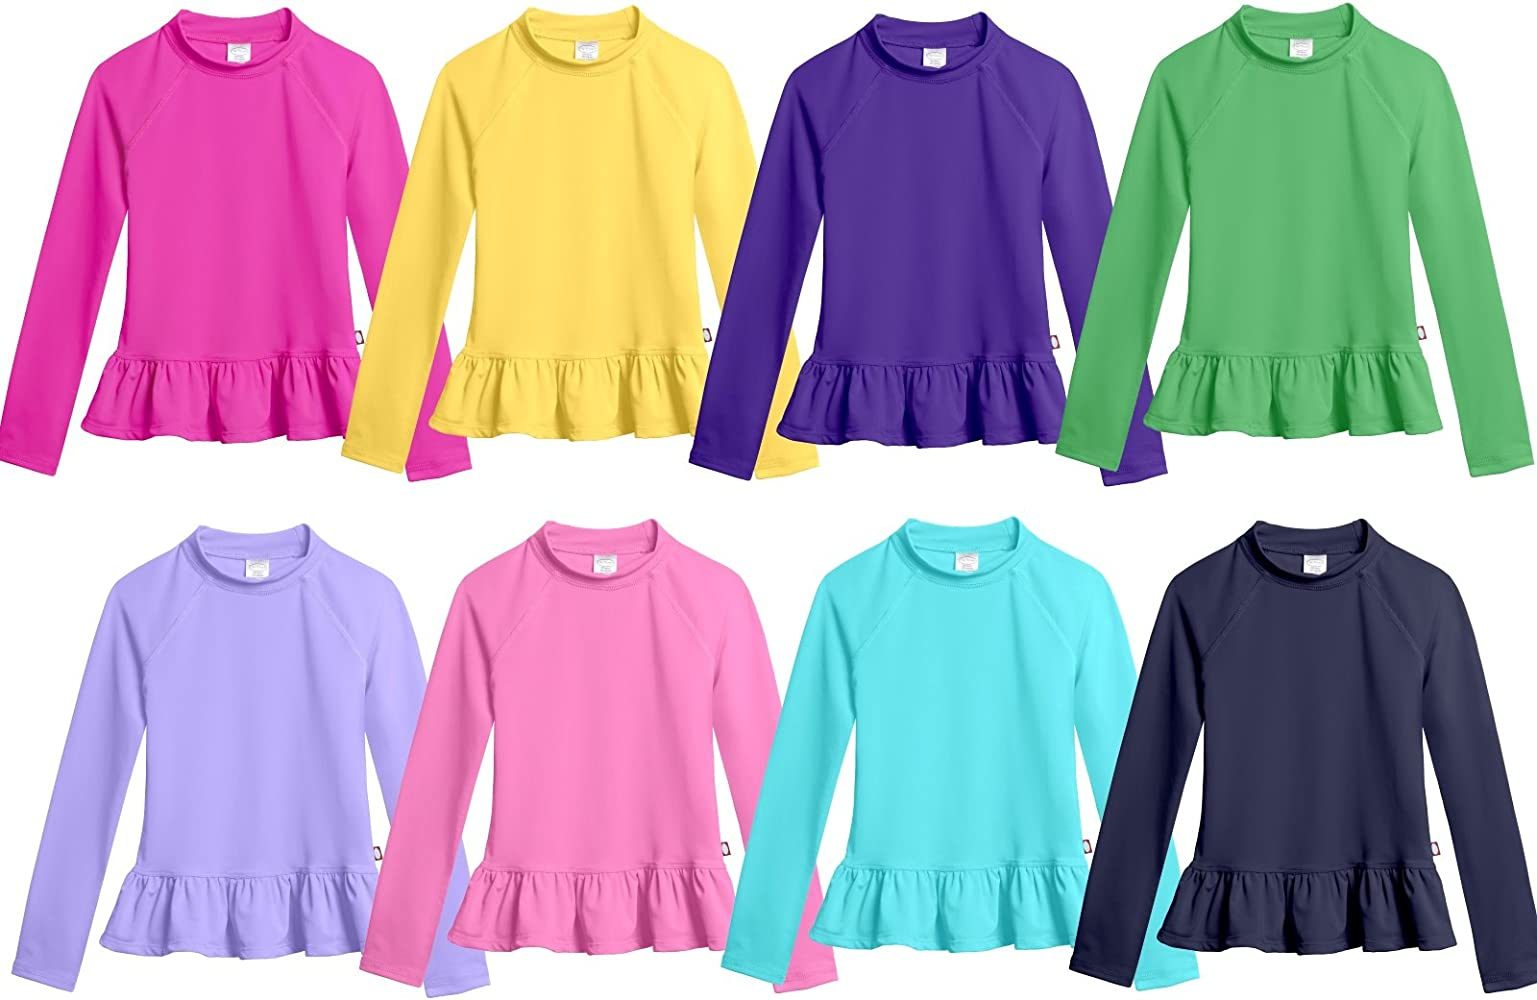 Hot Pink City Threads Baby Girls Puff Short Sleeve Rashguard Swimming Shirt Swim Top Rash Guard UPF Sun Protection for Summer Beach Pool and Play 12//18m